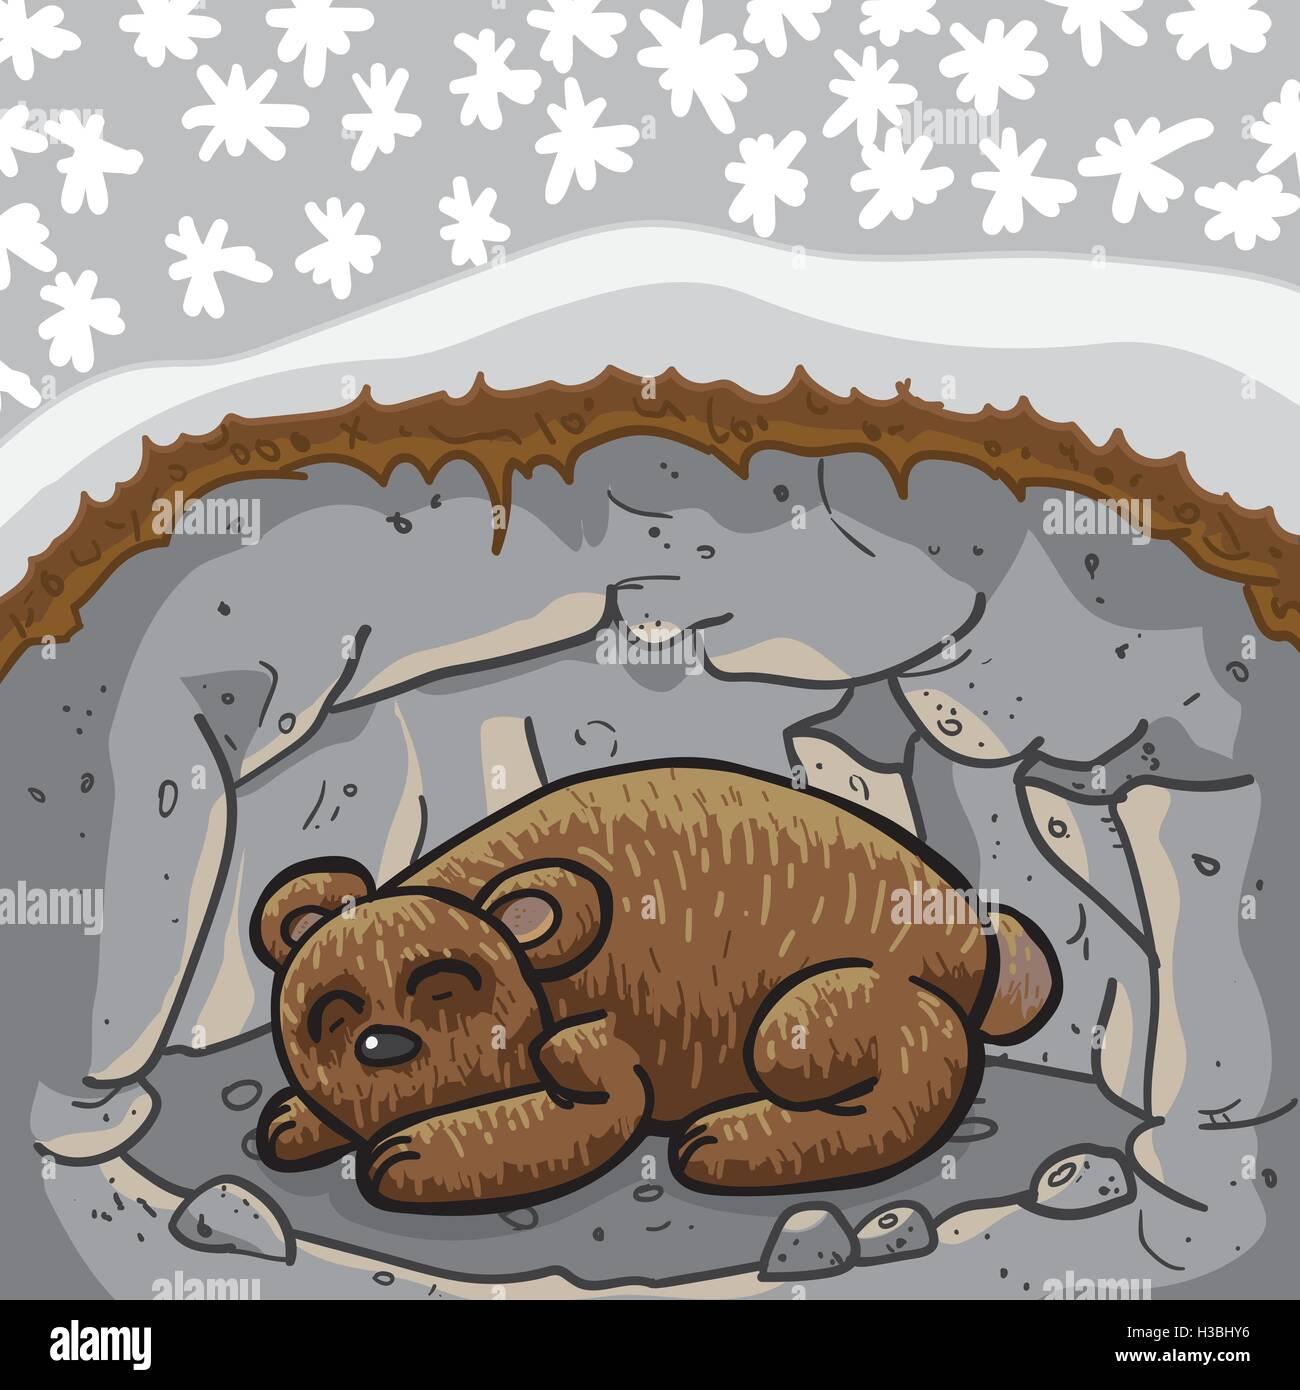 hibernation bear winter sleep animal stock photos. Black Bedroom Furniture Sets. Home Design Ideas